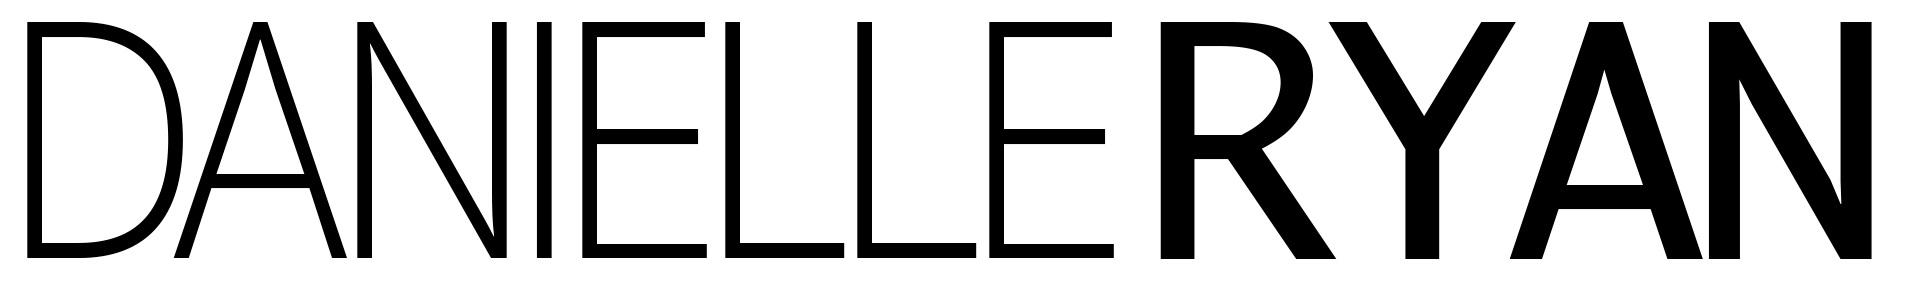 Danielle+Ryan+logo.jpg